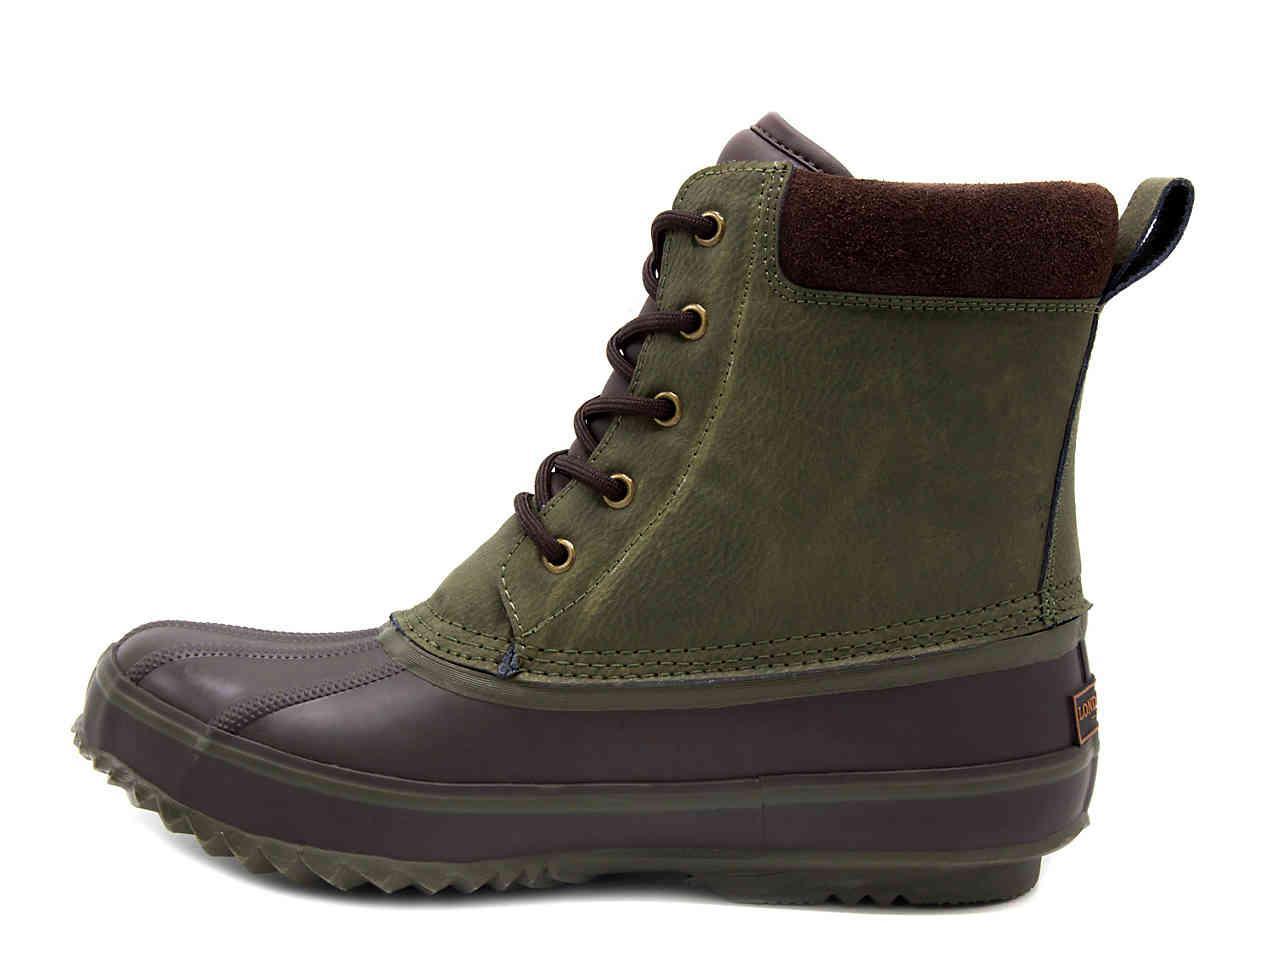 eb65c95d2d0 London Fog Green Ashford 2 Duck Boot for men